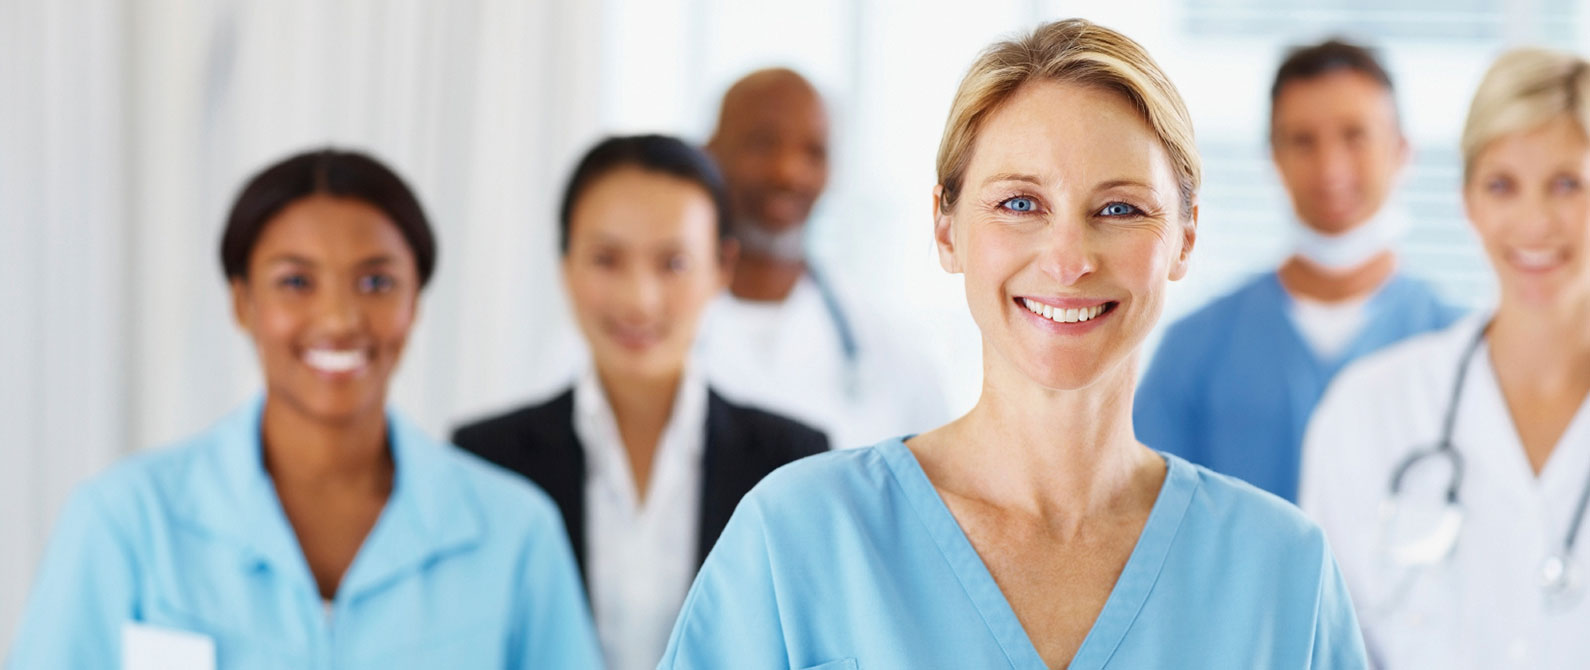 nurse-with-medical-staff